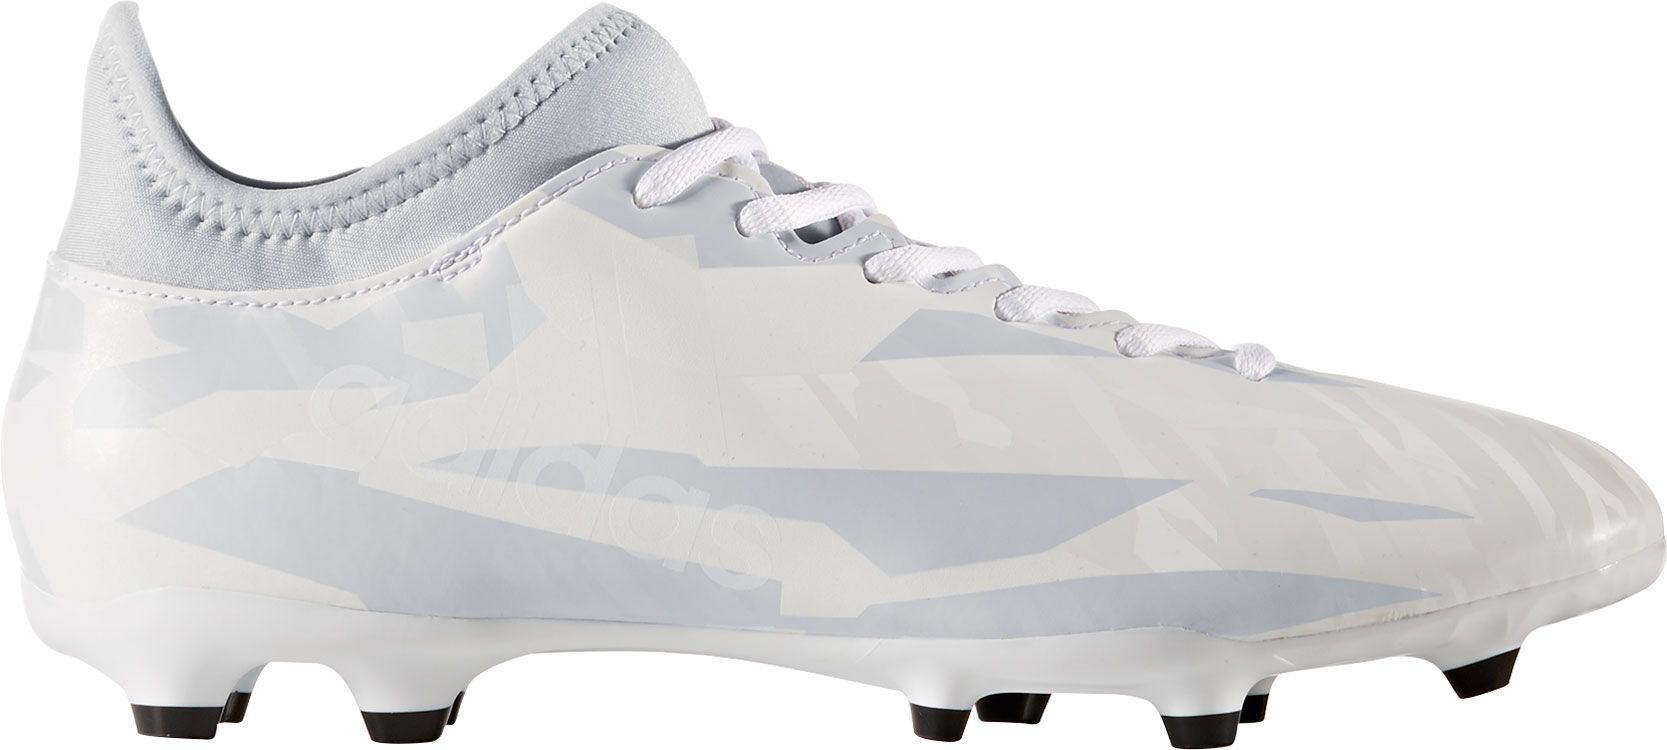 adidas Mens X 16.3 FG Soccer Cleats  DICKS Sporting Goods